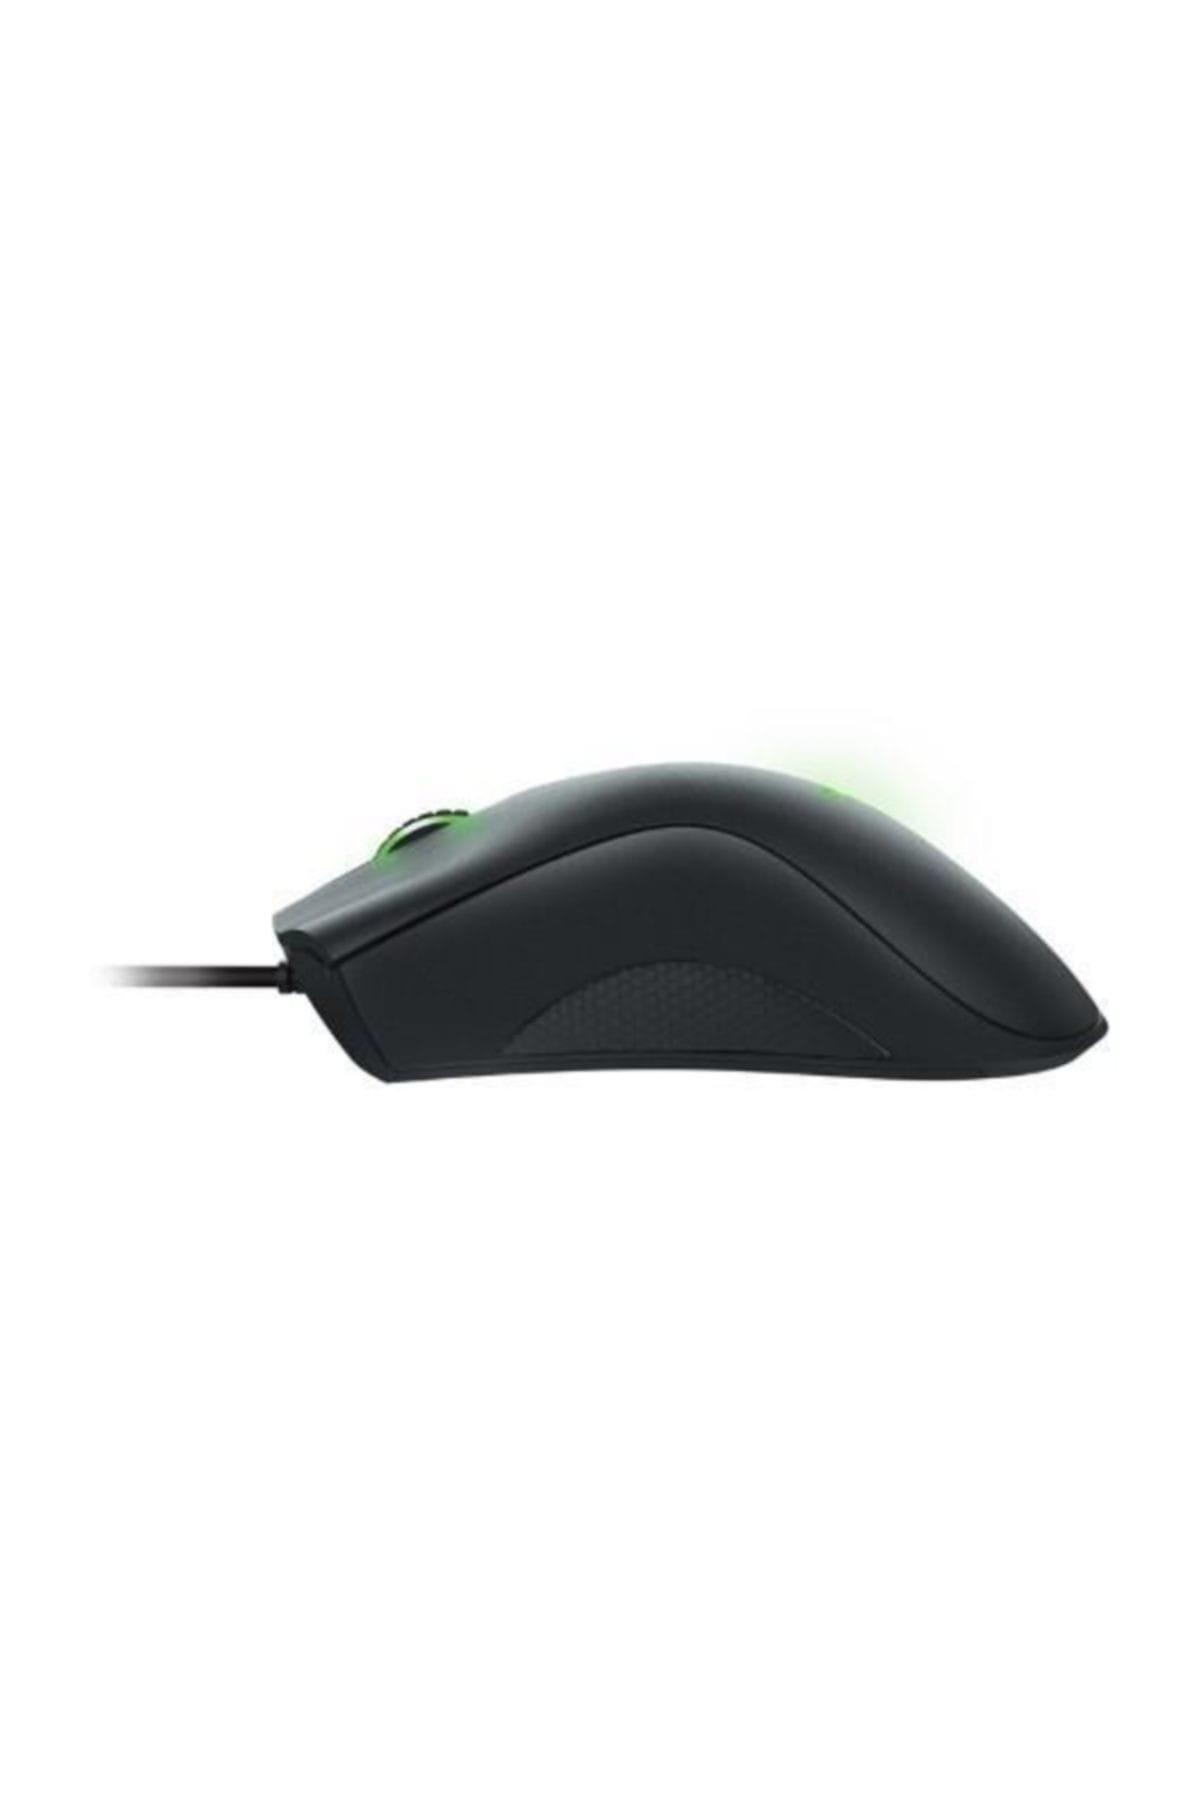 RAZER Deathadder RZ01-01630100-R3R1 3500 Mouse